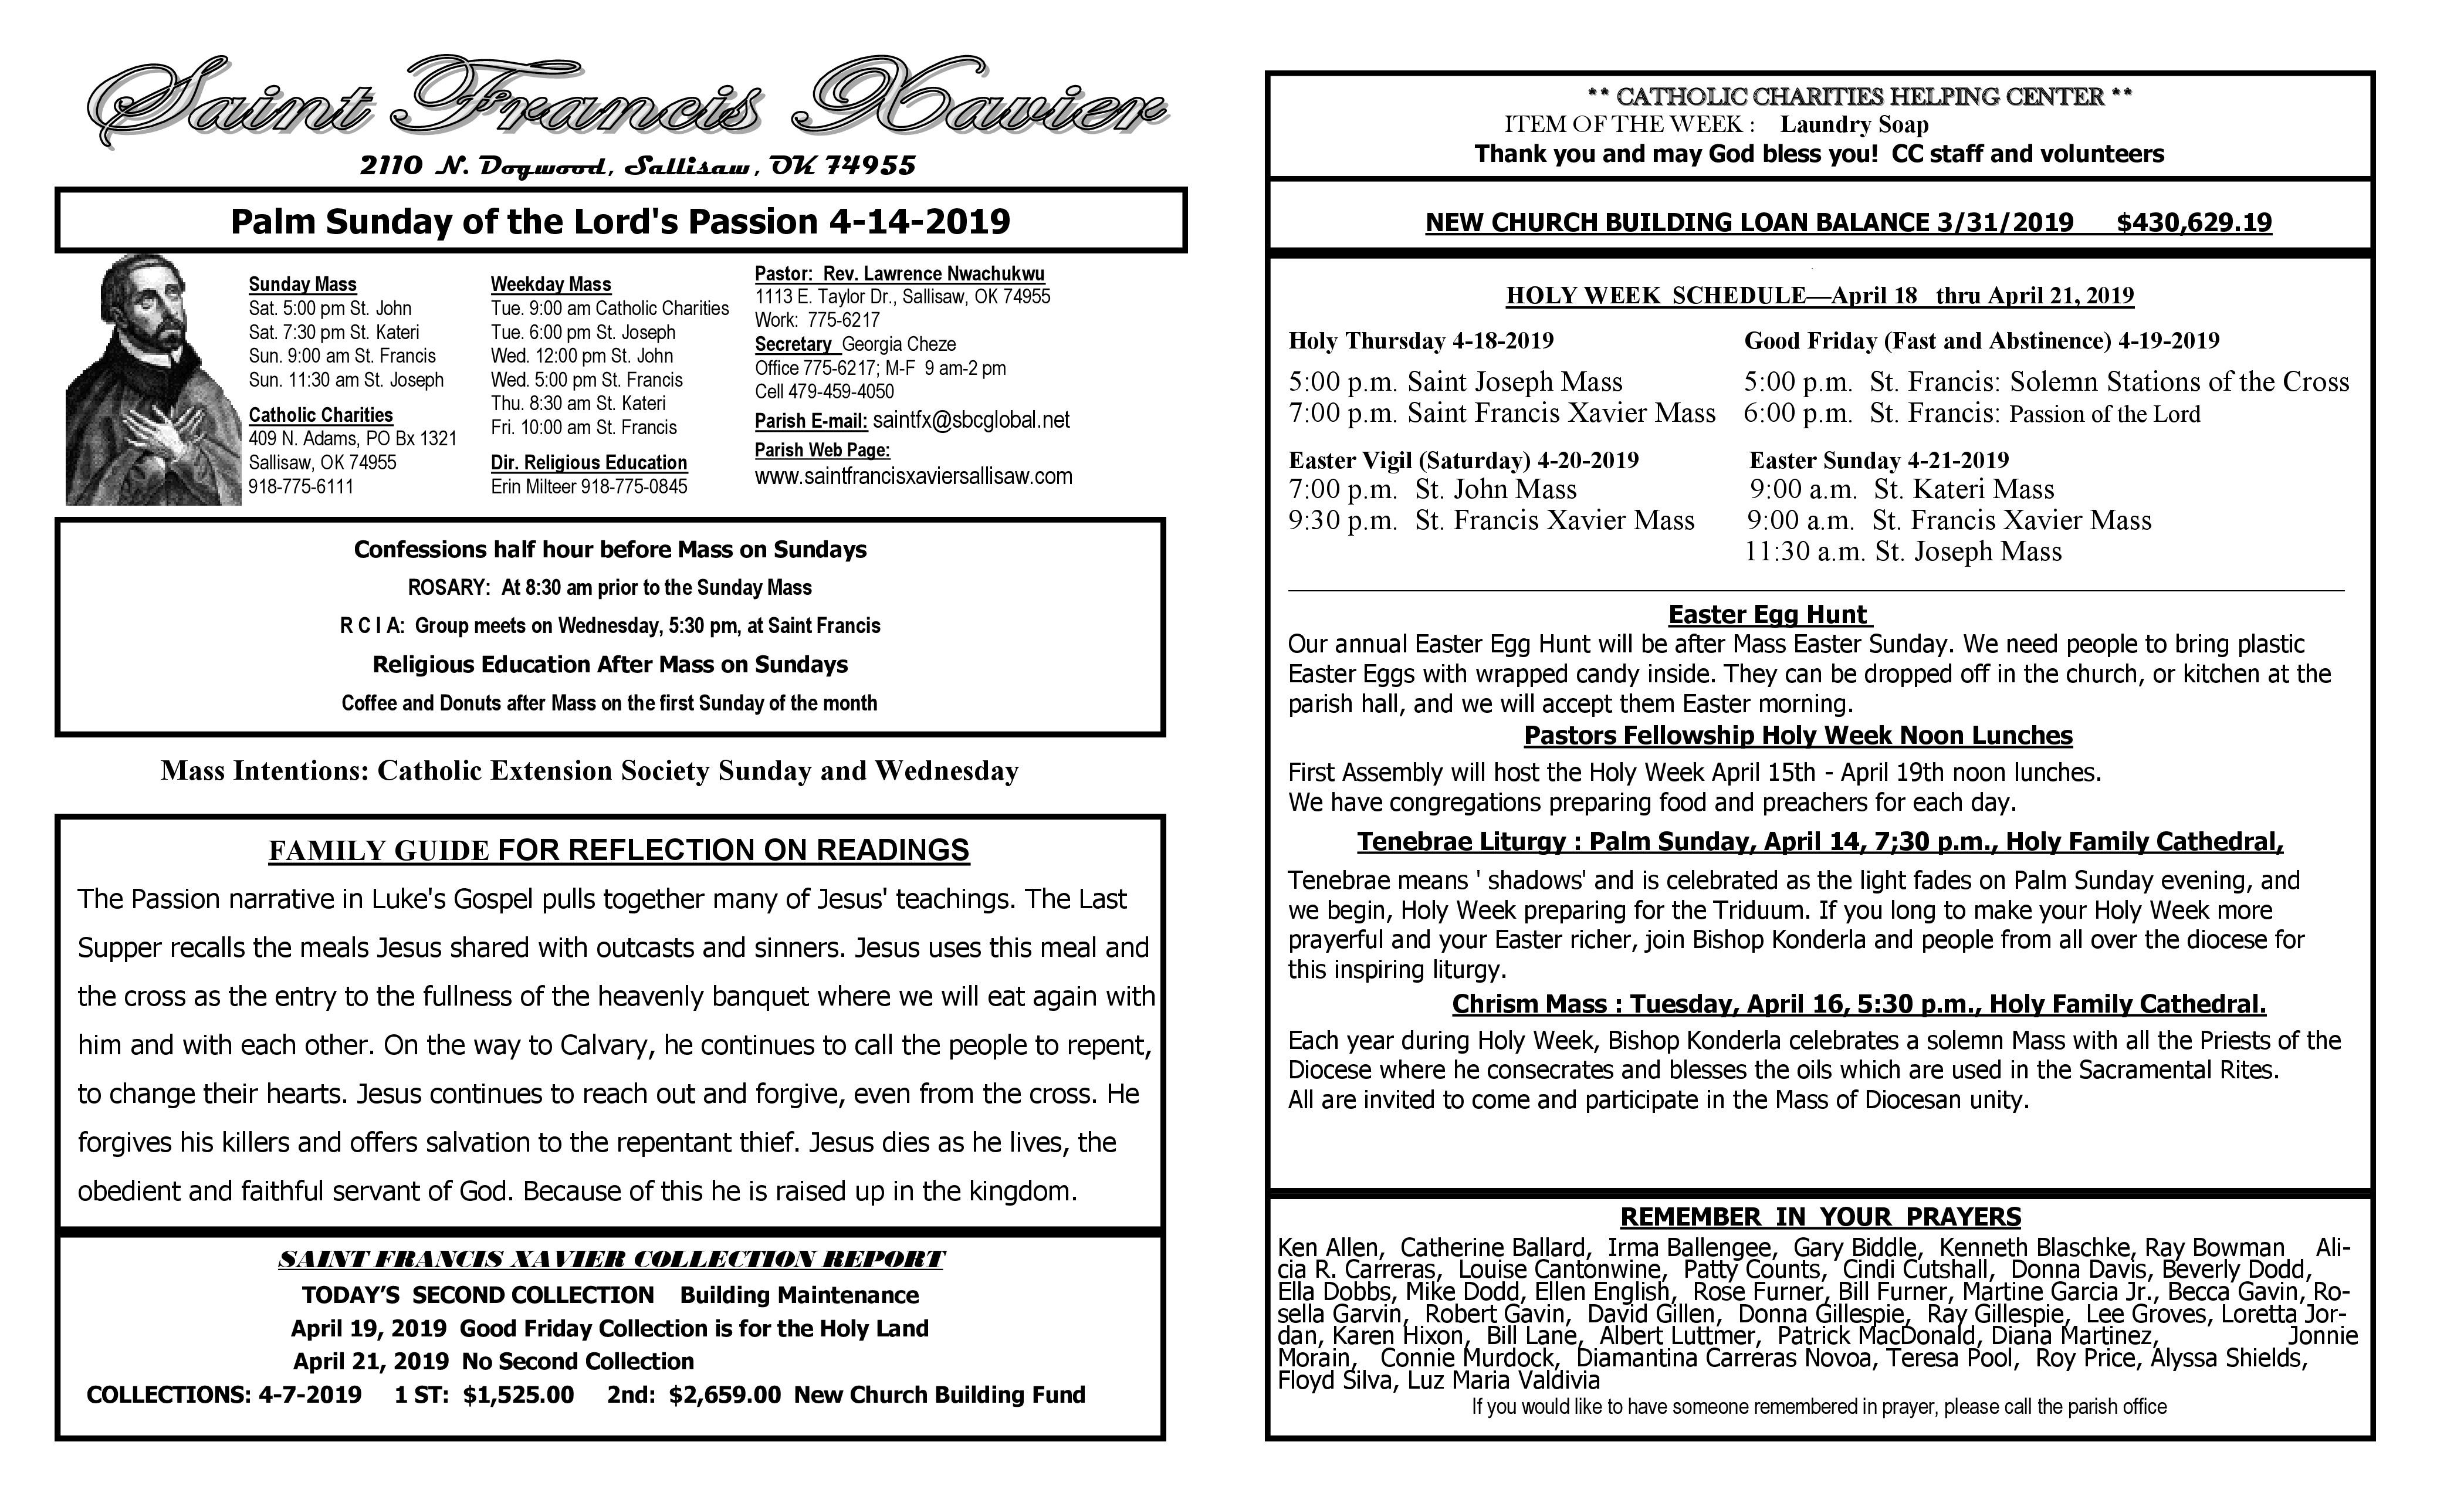 Testimonials throughout Catholic Extension Calendar